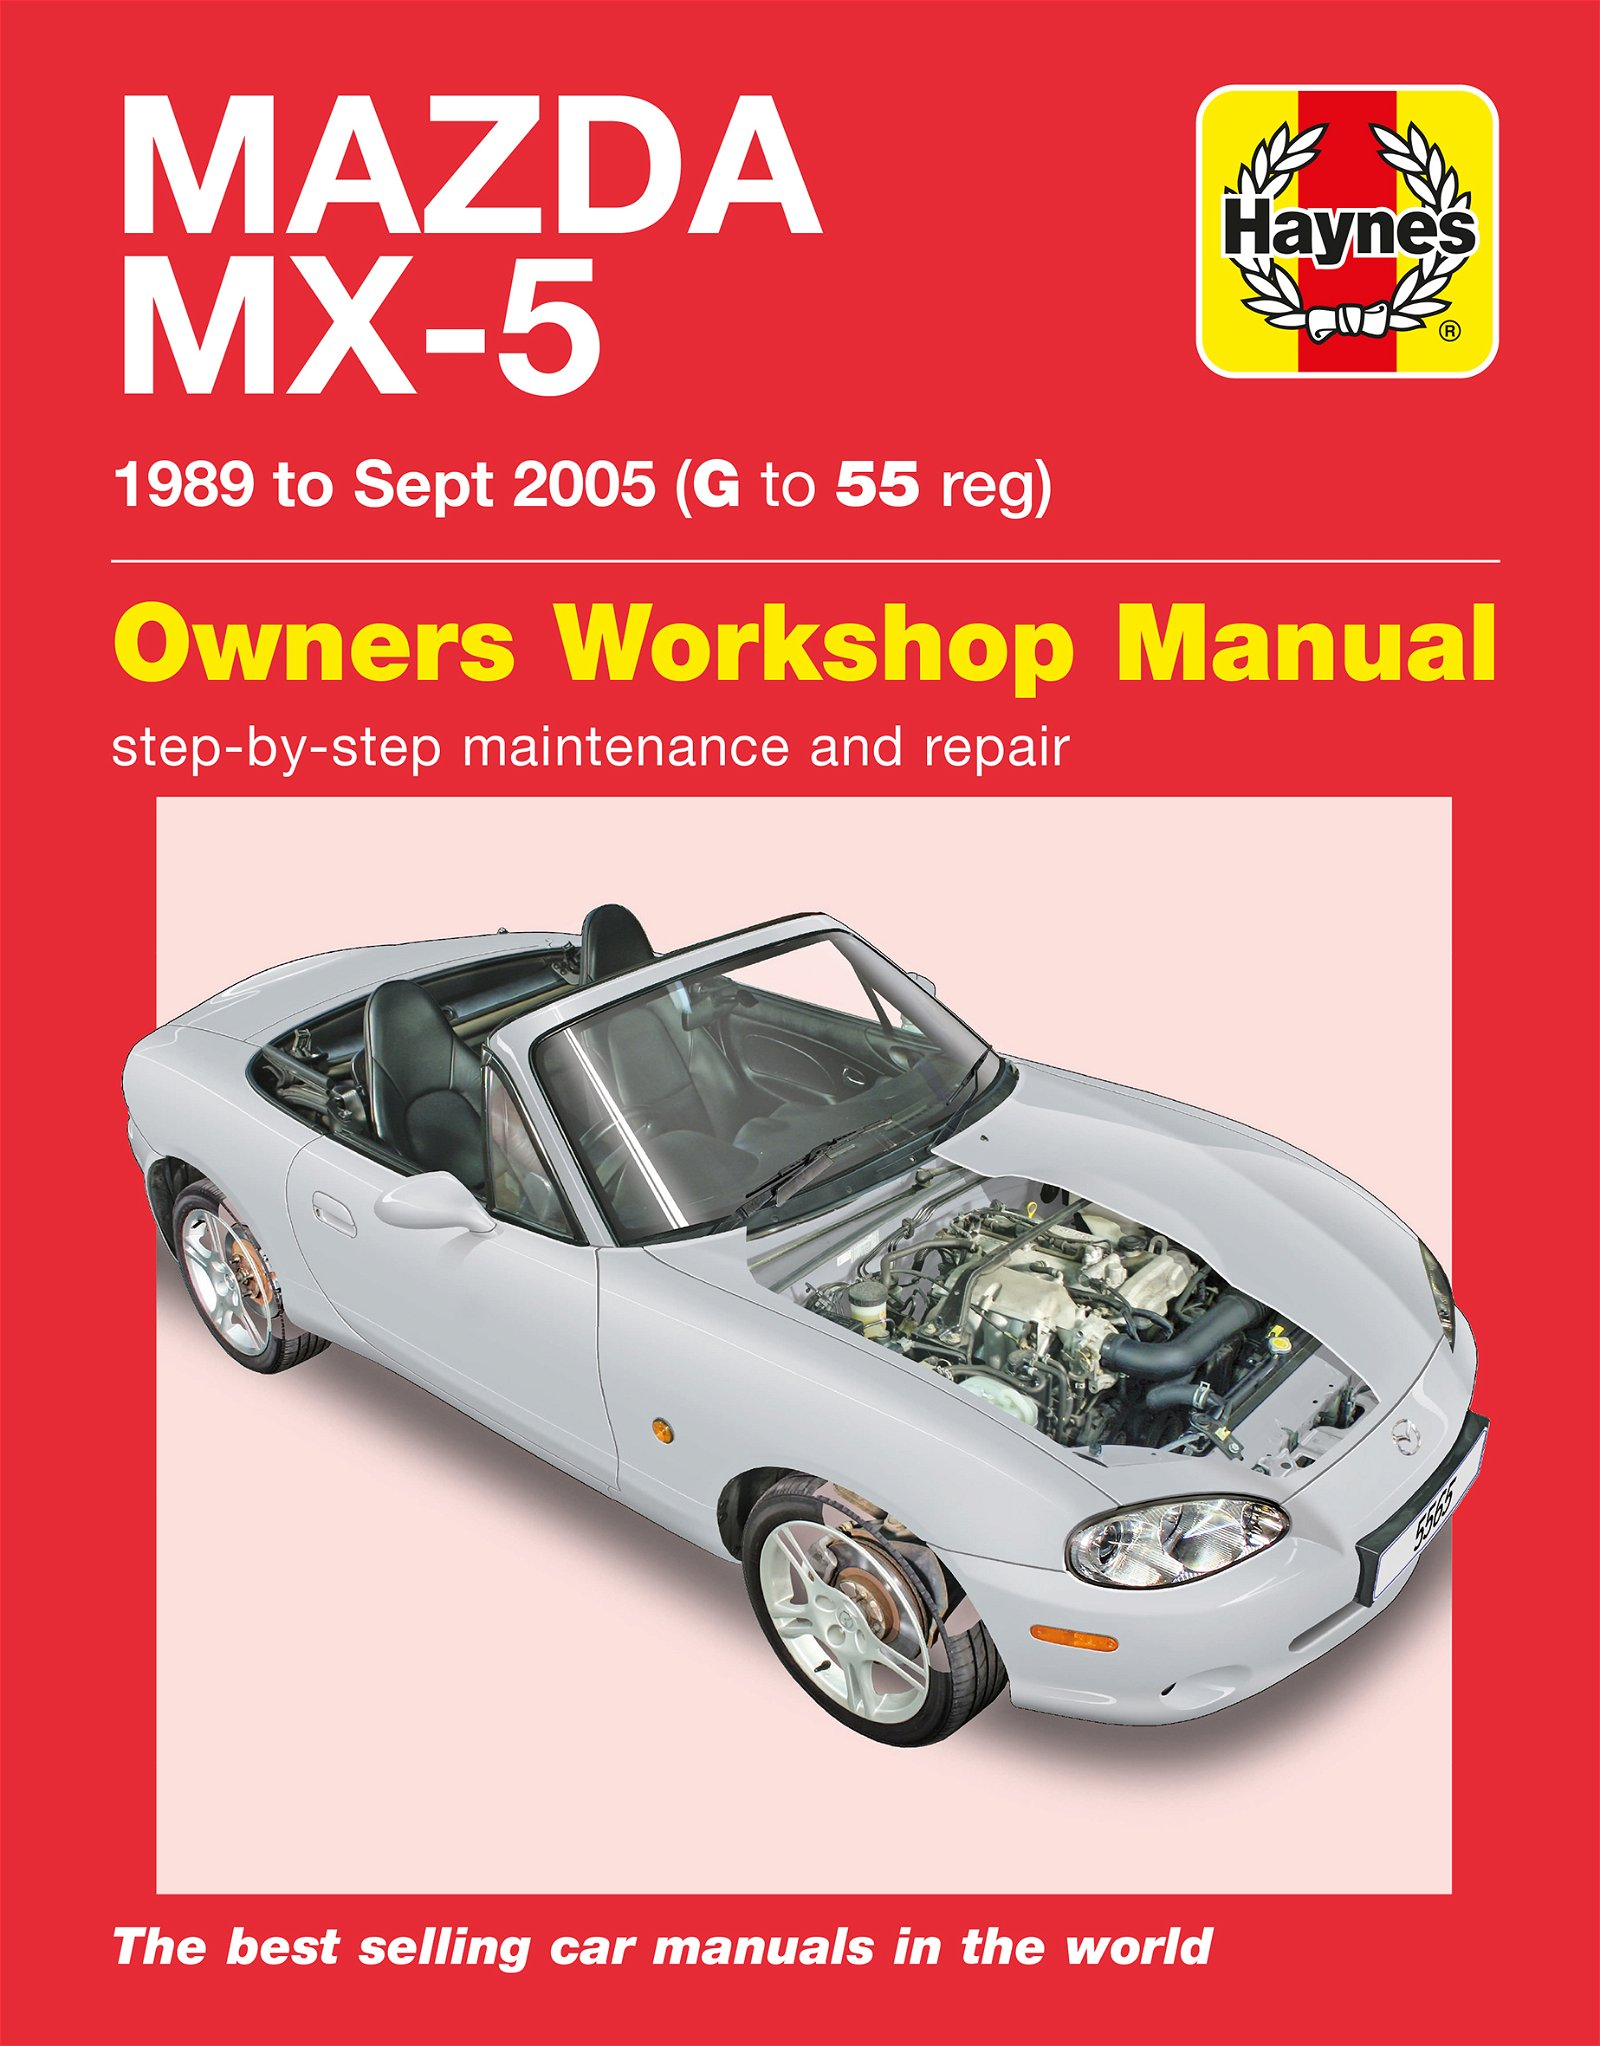 [Manuel UK en Anglais] Mazda MX-5  (89 - 05)  G to 05